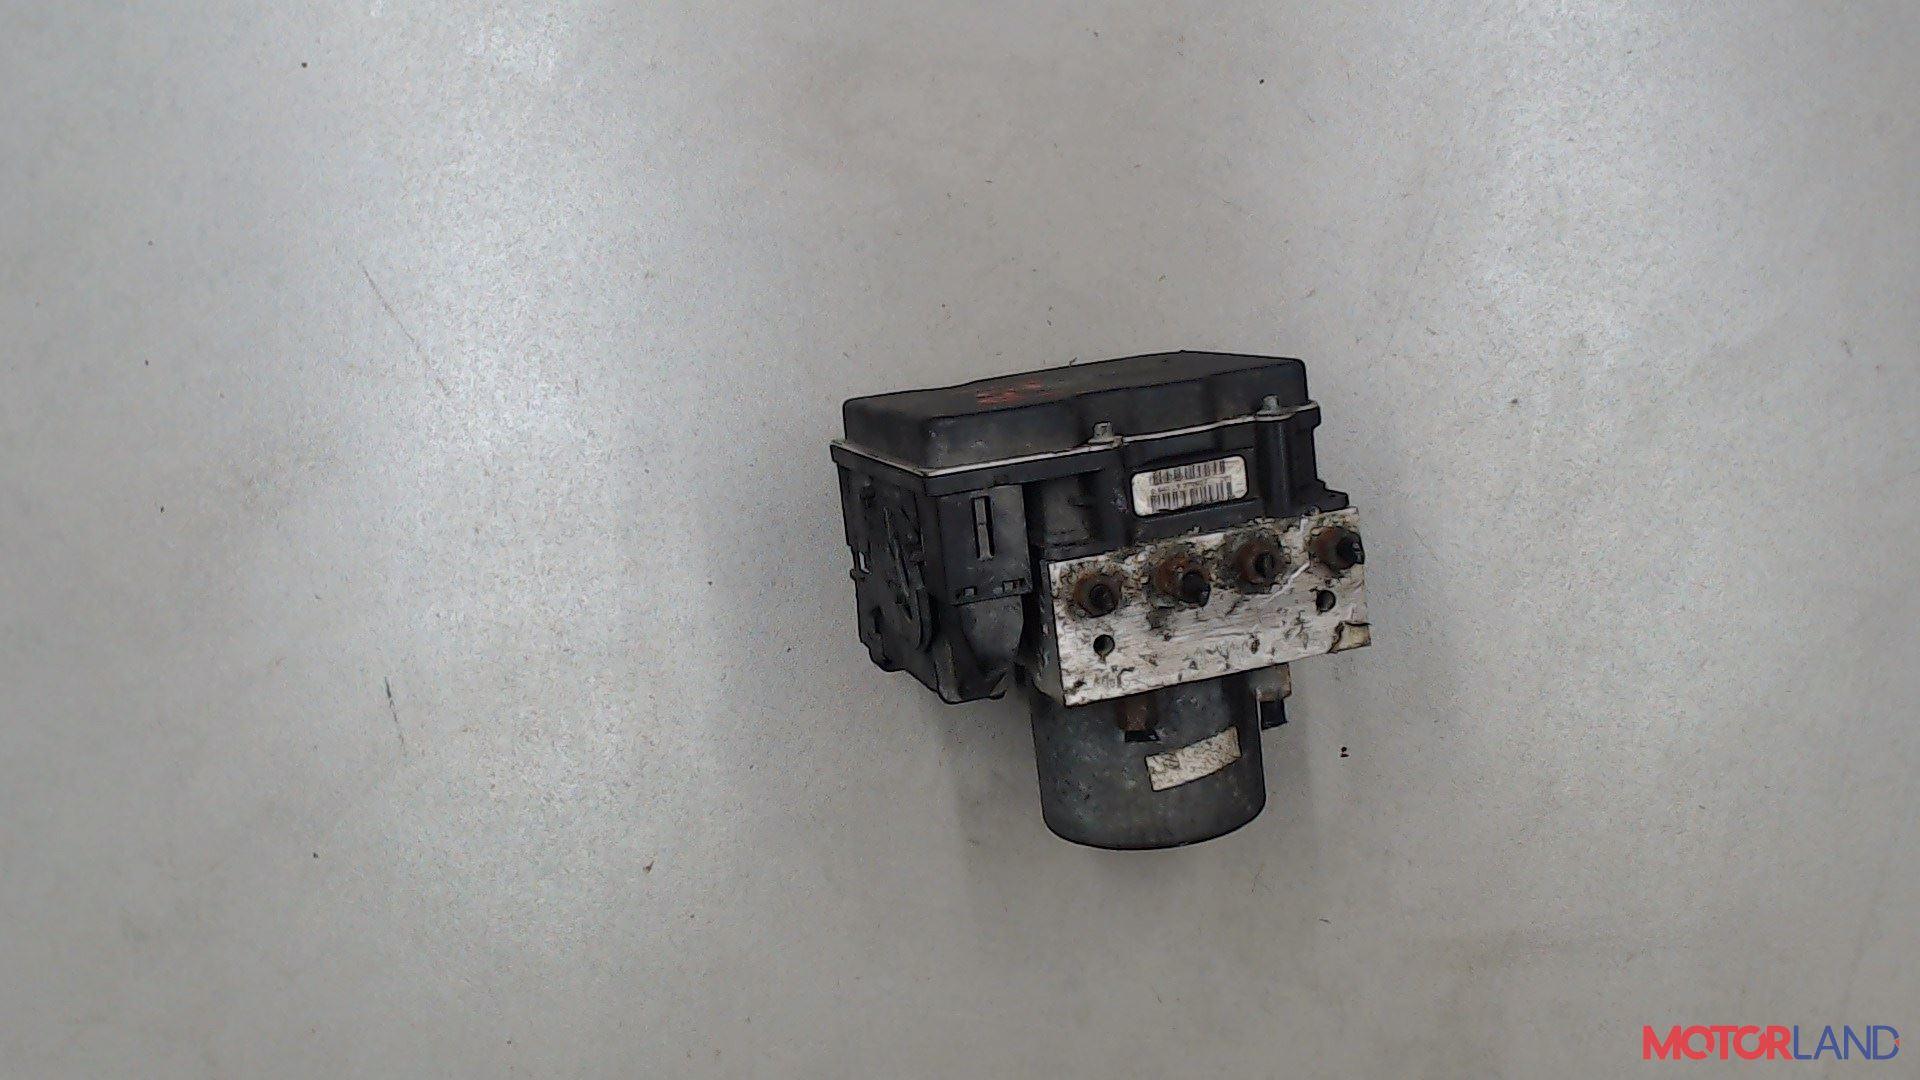 Блок АБС, насос (ABS, ESP, ASR) Mazda CX-7 2007-2012 2.3 л. 2008 L3 б/у #1